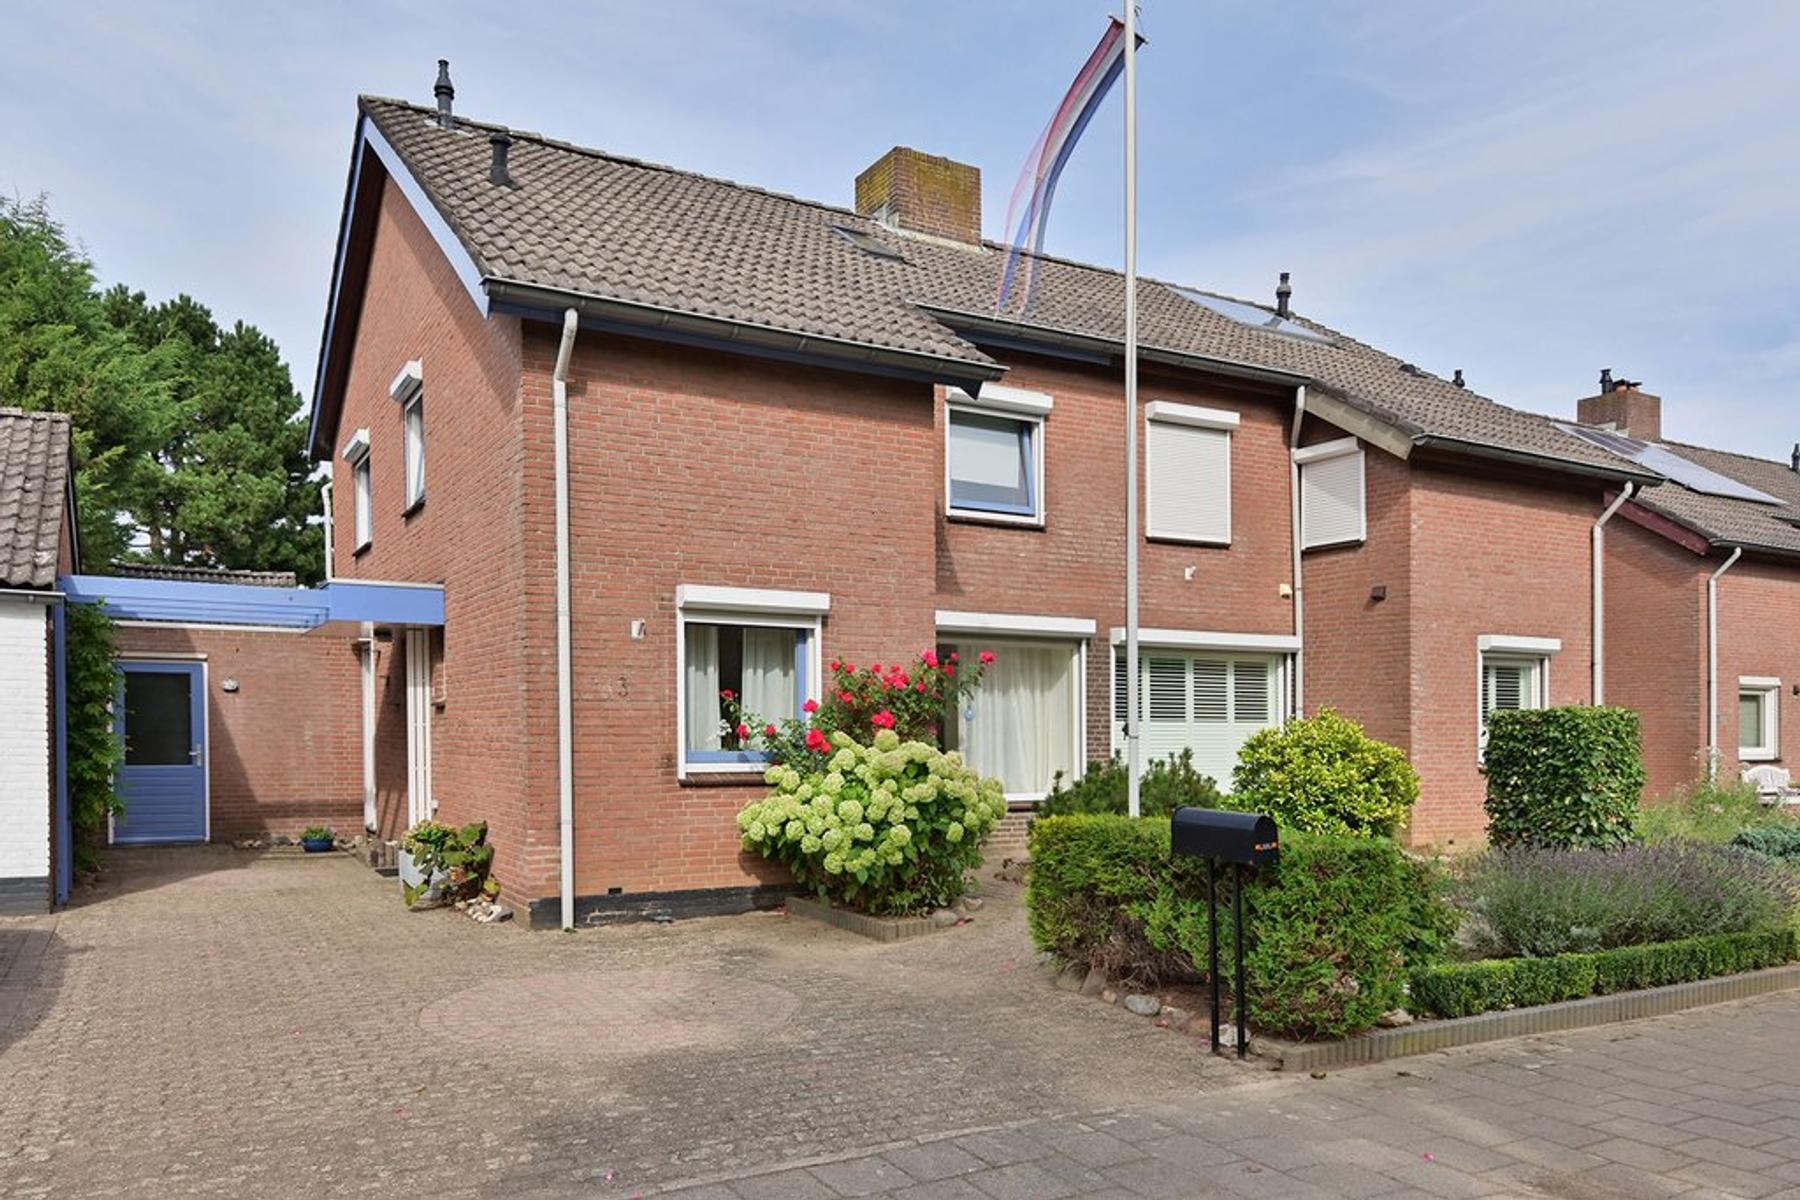 Grootveldstraat 3 in Limbricht 6141 LV